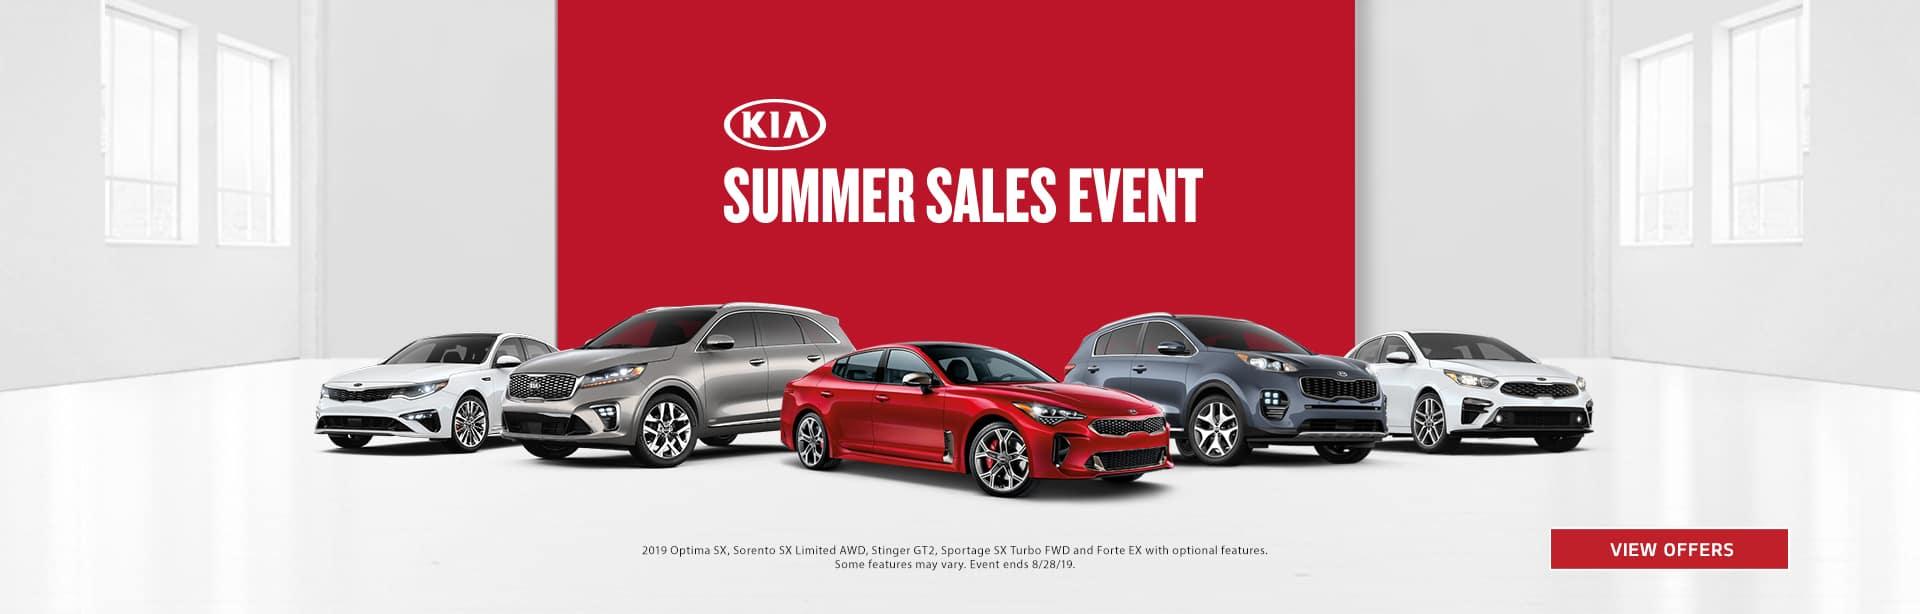 hight resolution of summer sales event 201914